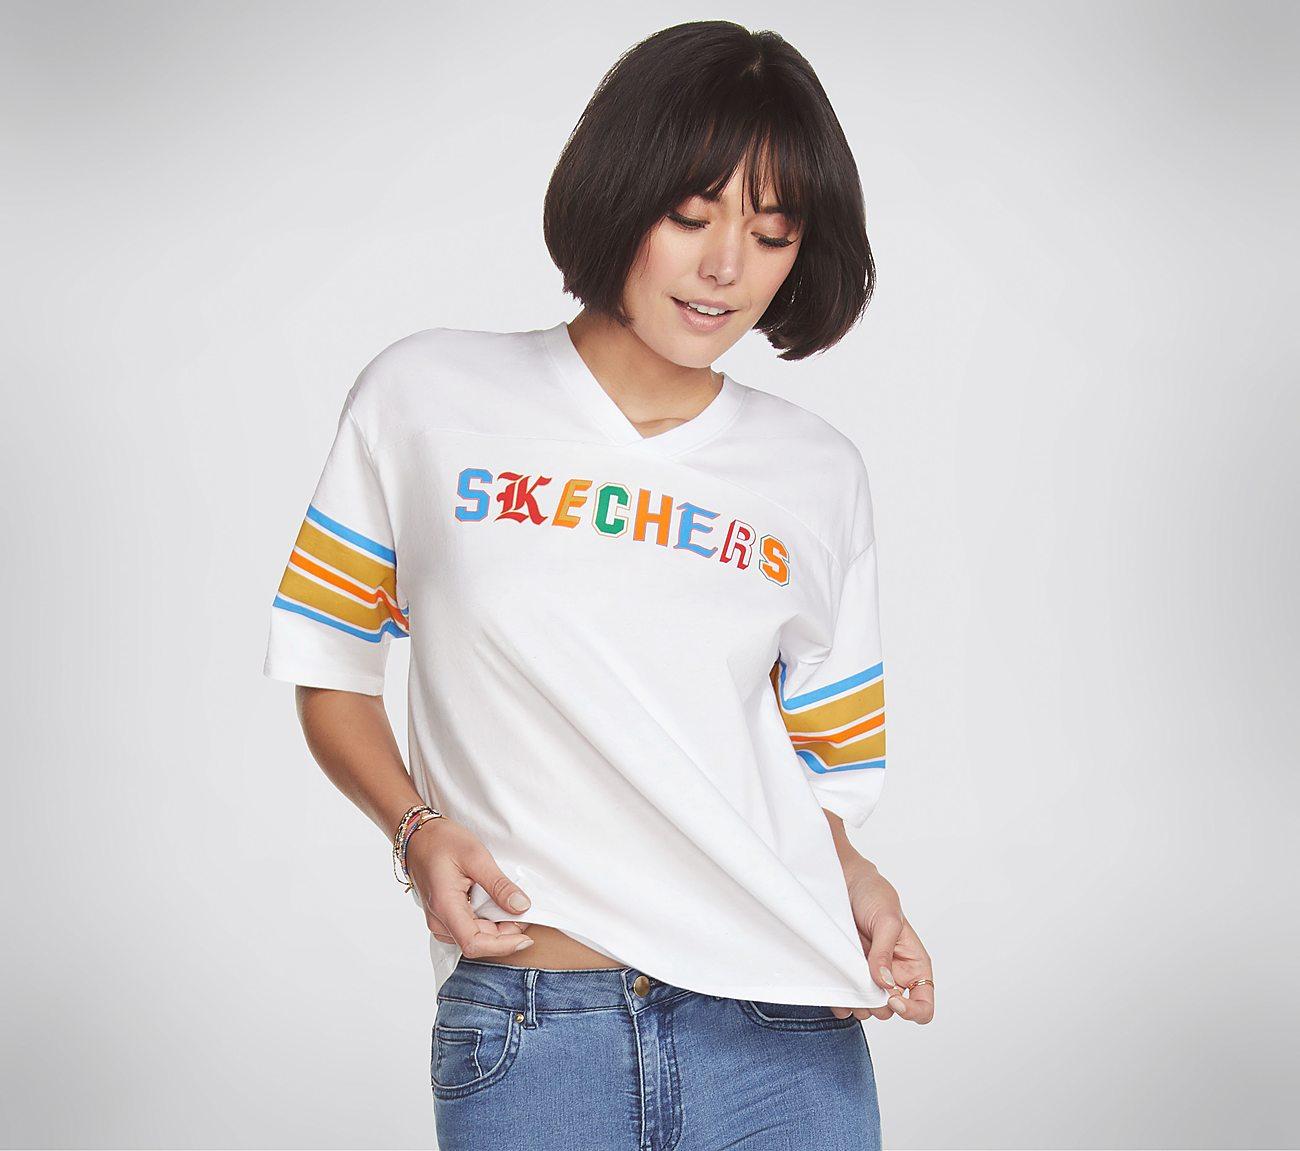 Skechers Apparel Primary Football Tee Shirt